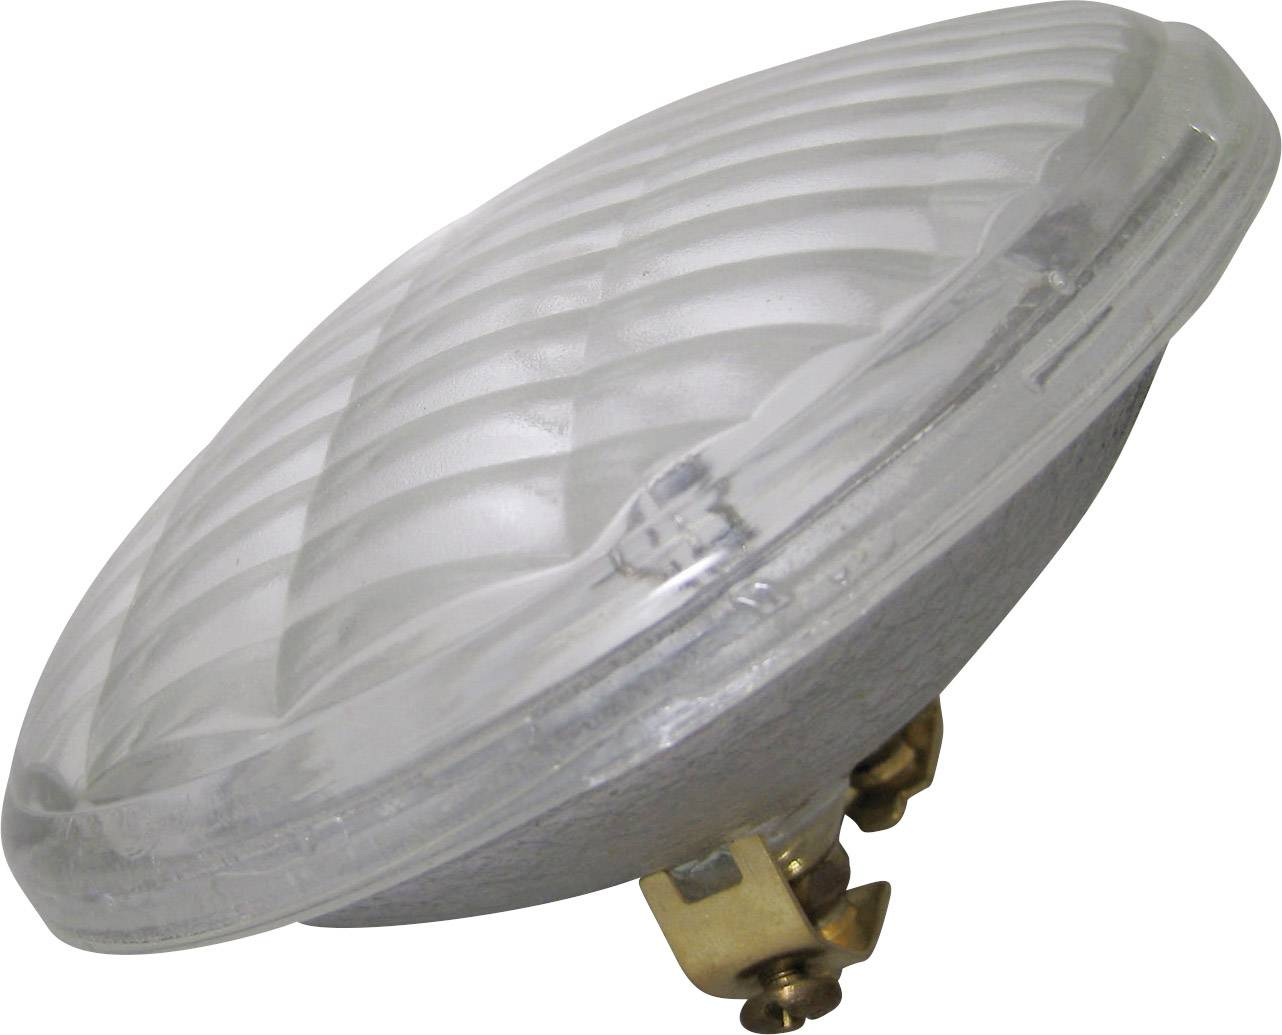 Bodová žárovka PAR 36, typ flood, G5.3, 30 W